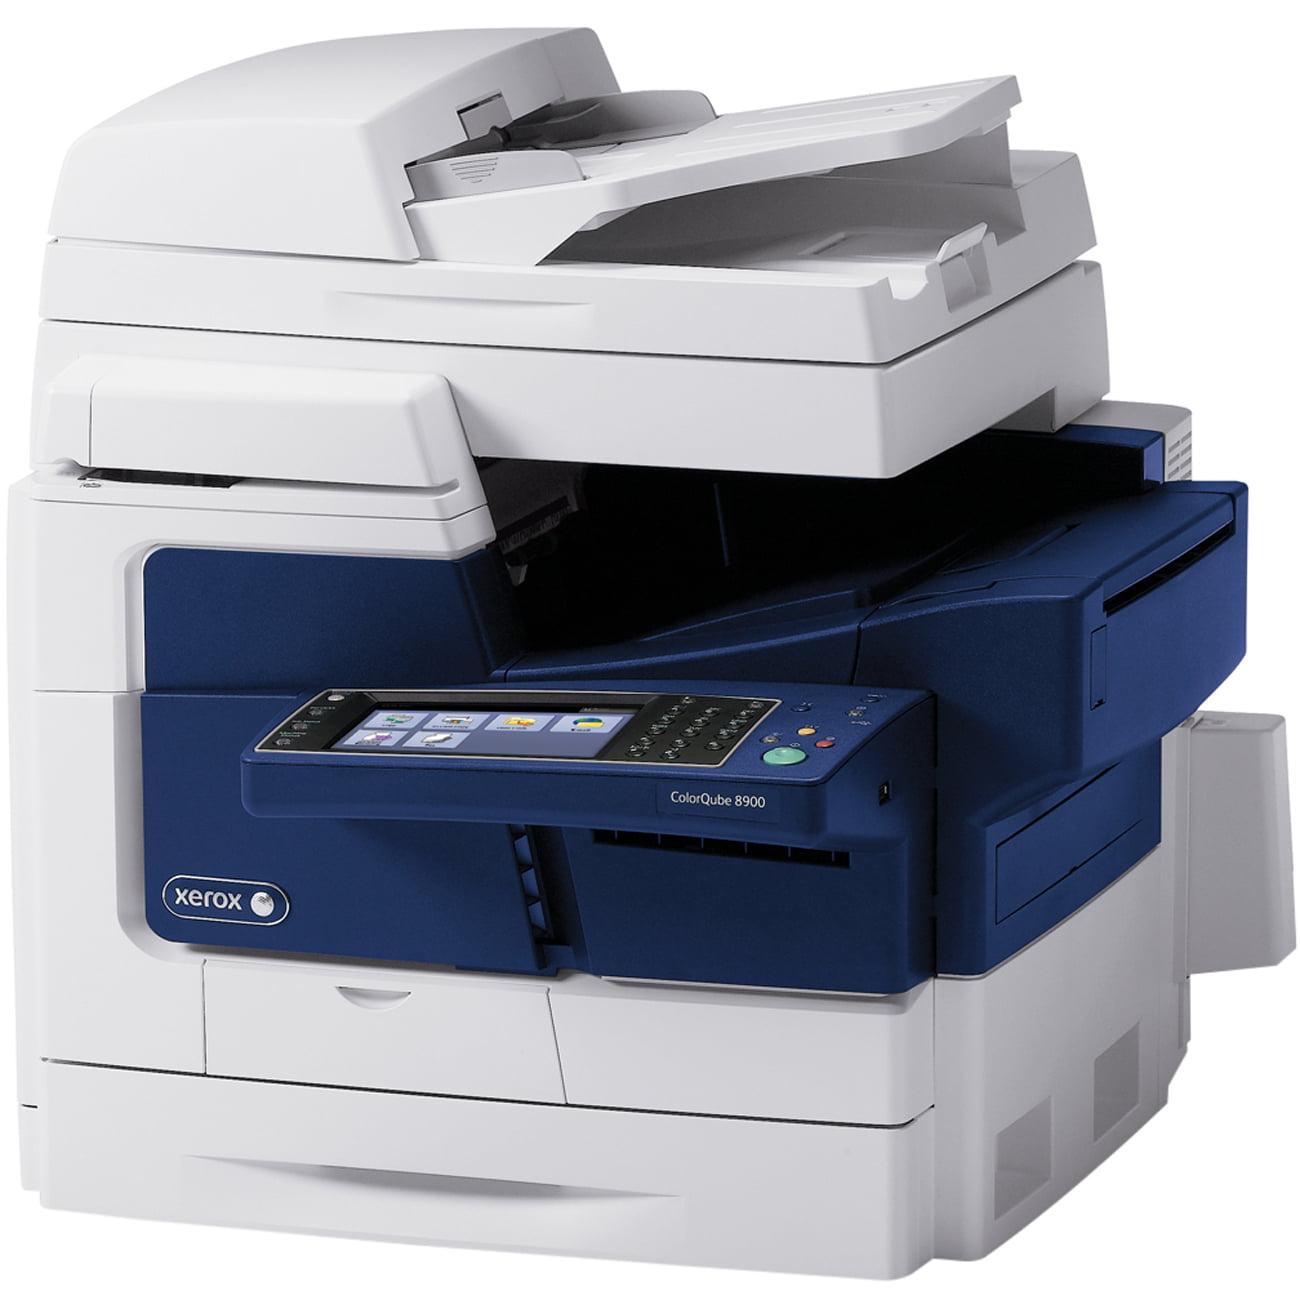 Xerox ColorQube 8900X Solid Ink Multifunction Printer - Color - Plain Paper Print - Desktop - Copier/Fax/Printer/Scann